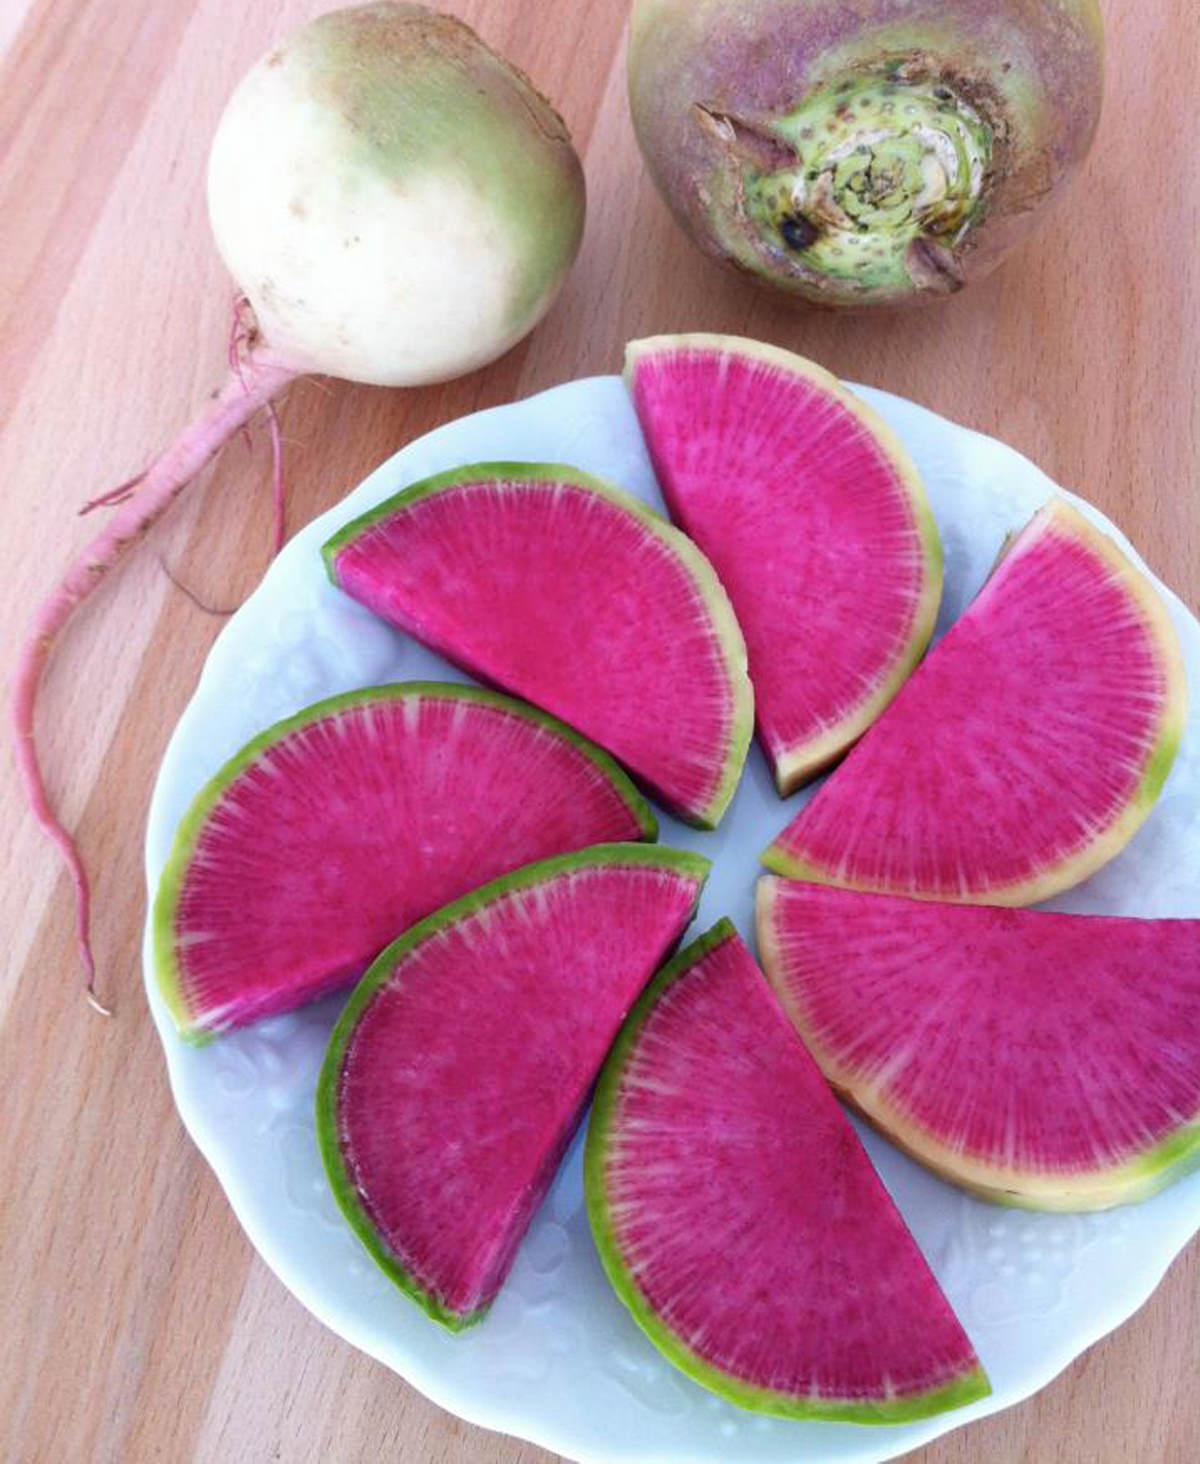 The-Watermelon-Radish